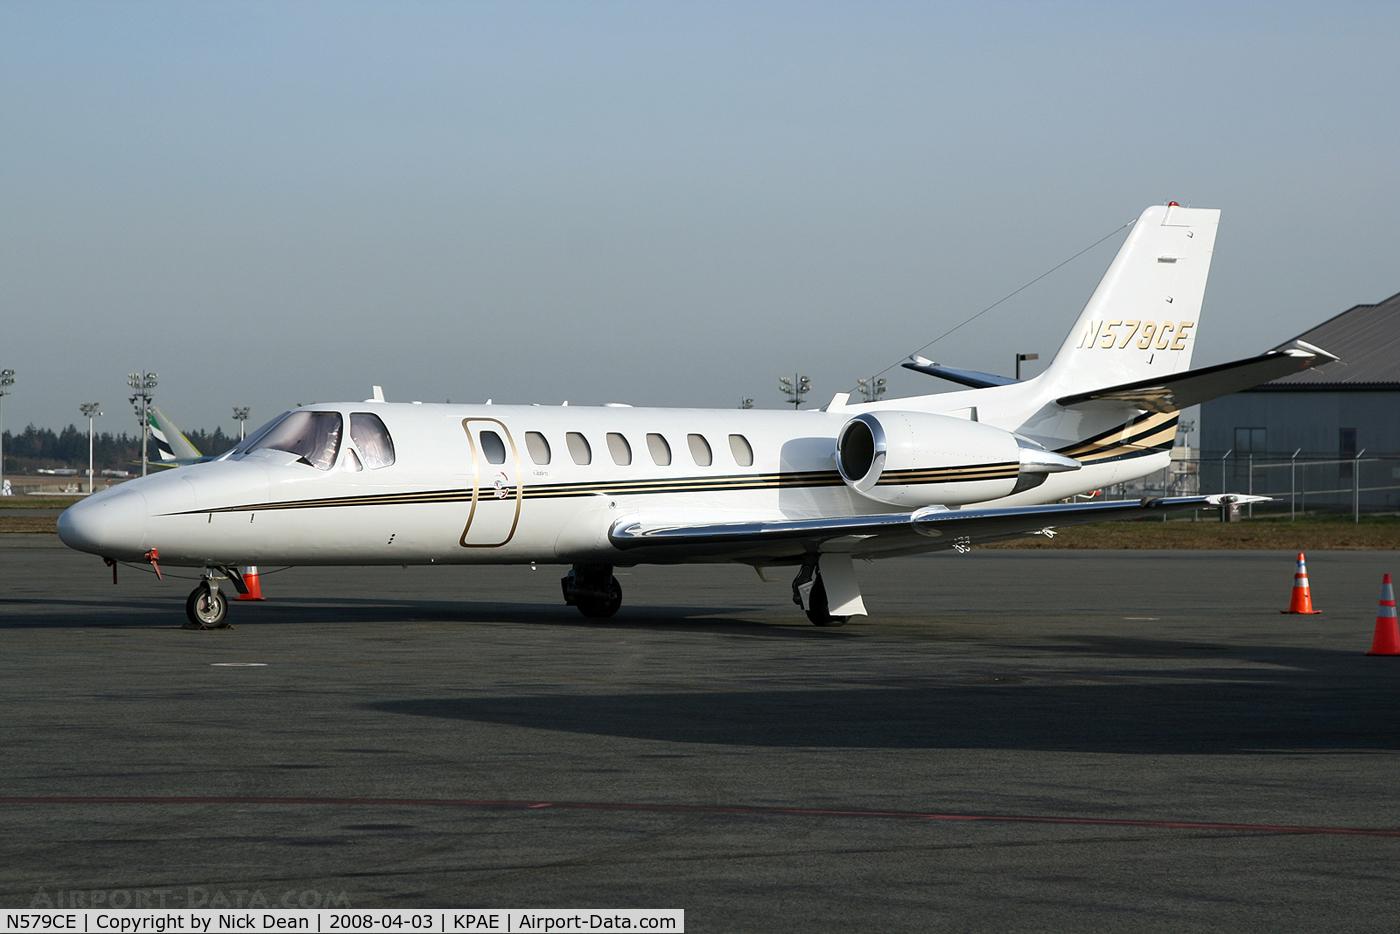 N579CE, 2001 Cessna 560 C/N 560-0579, KPAE